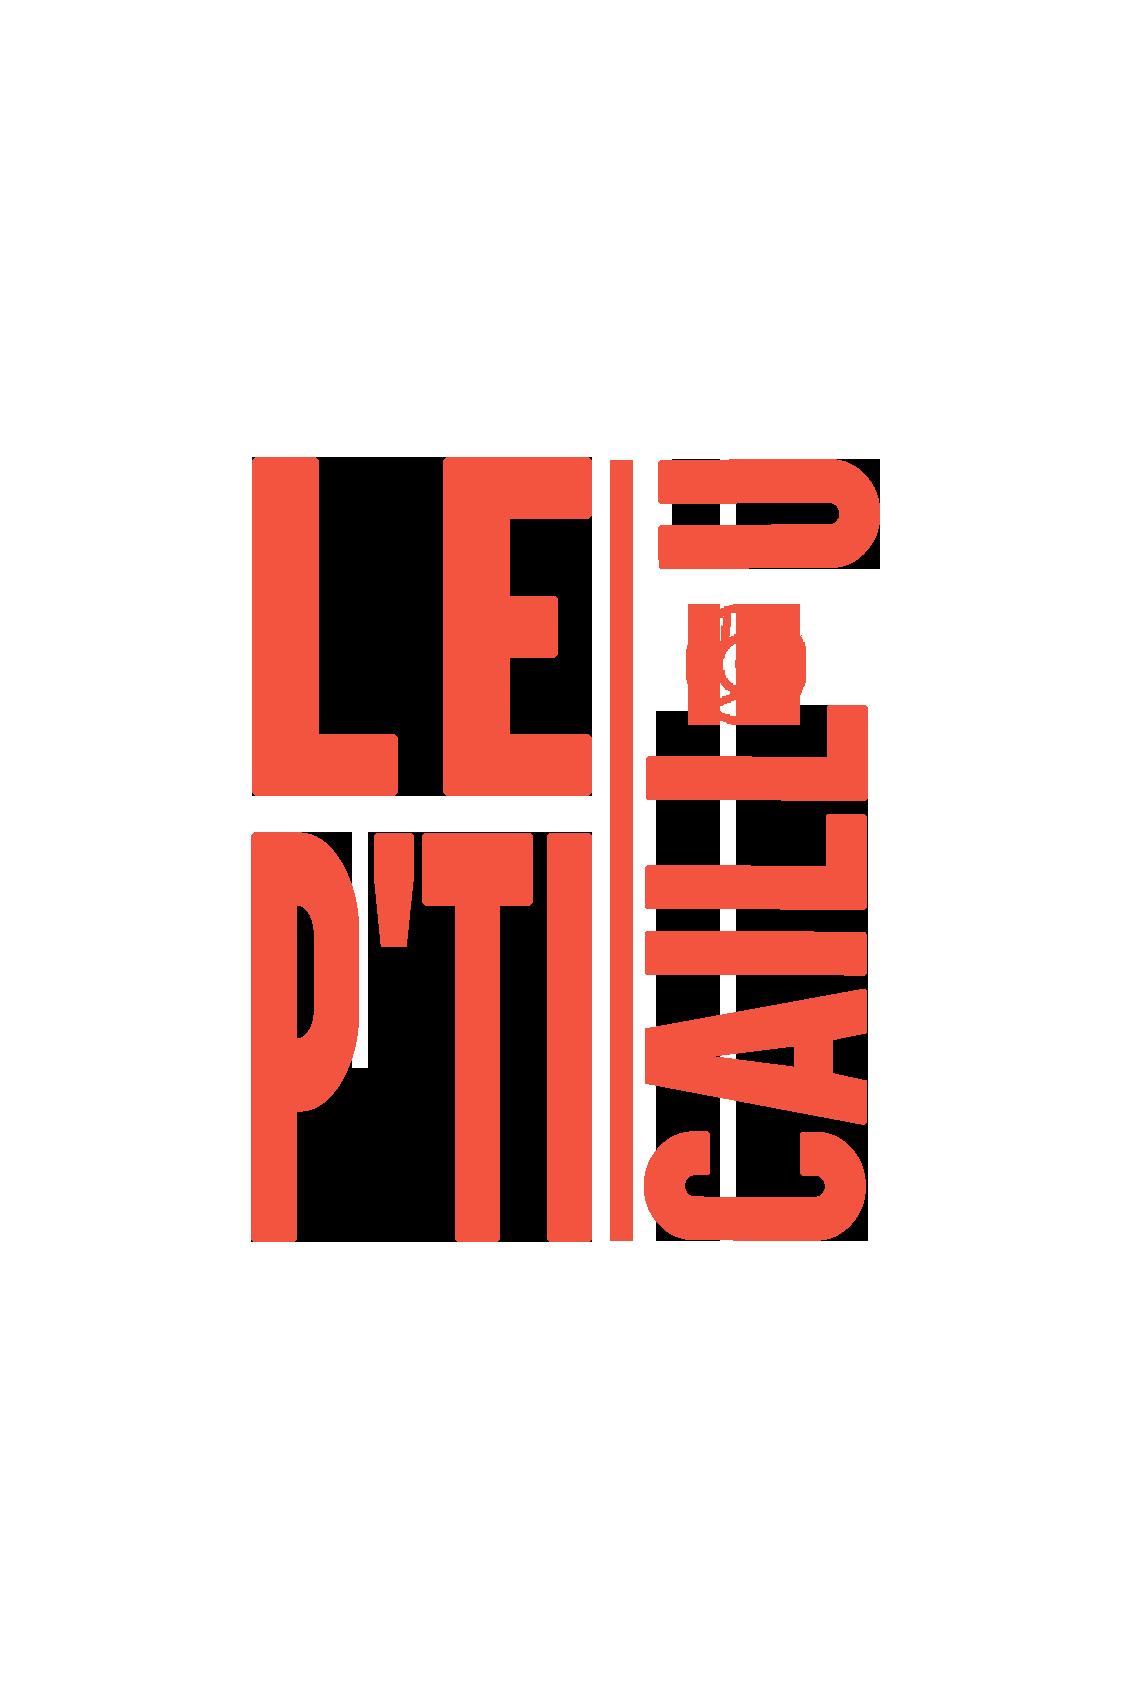 Le P'ti Caillou